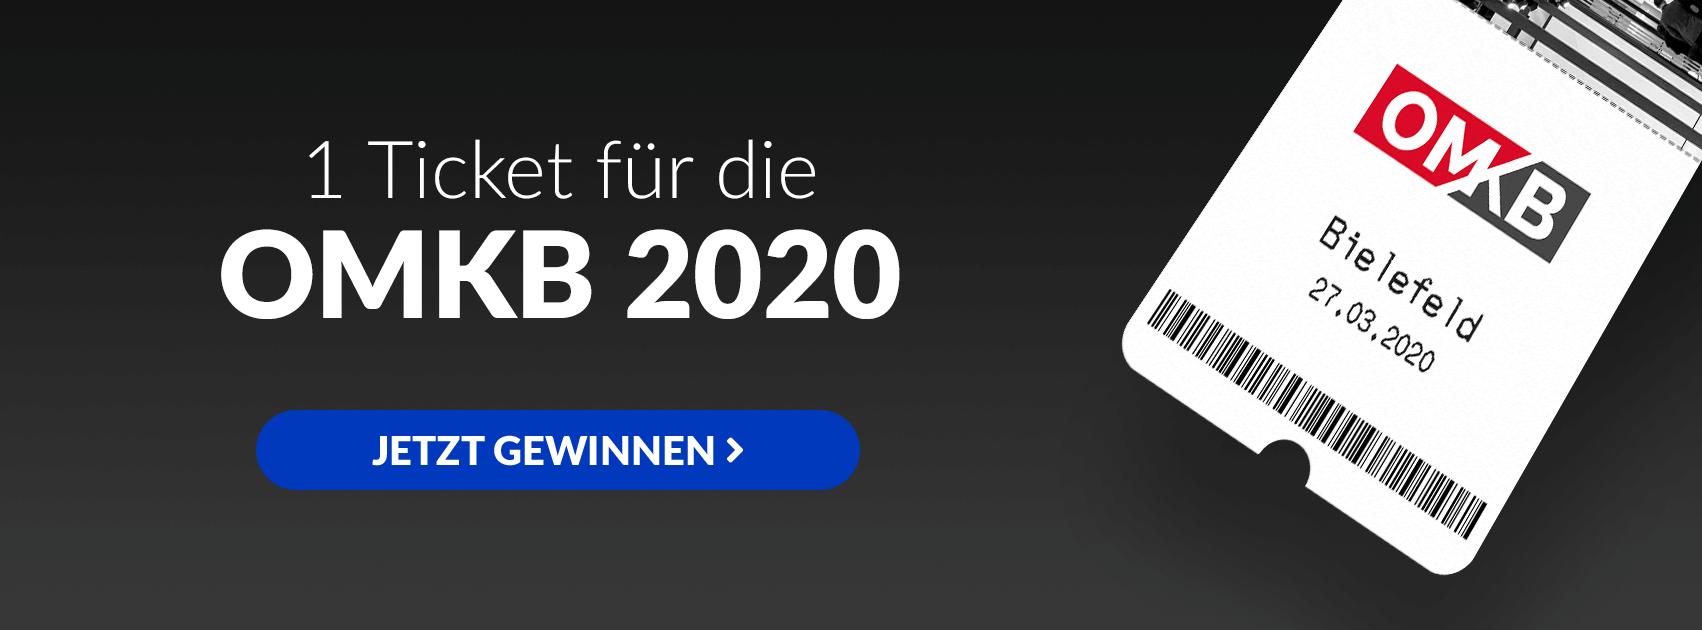 GrowthUp - Ticketverlosung OMKB 2020